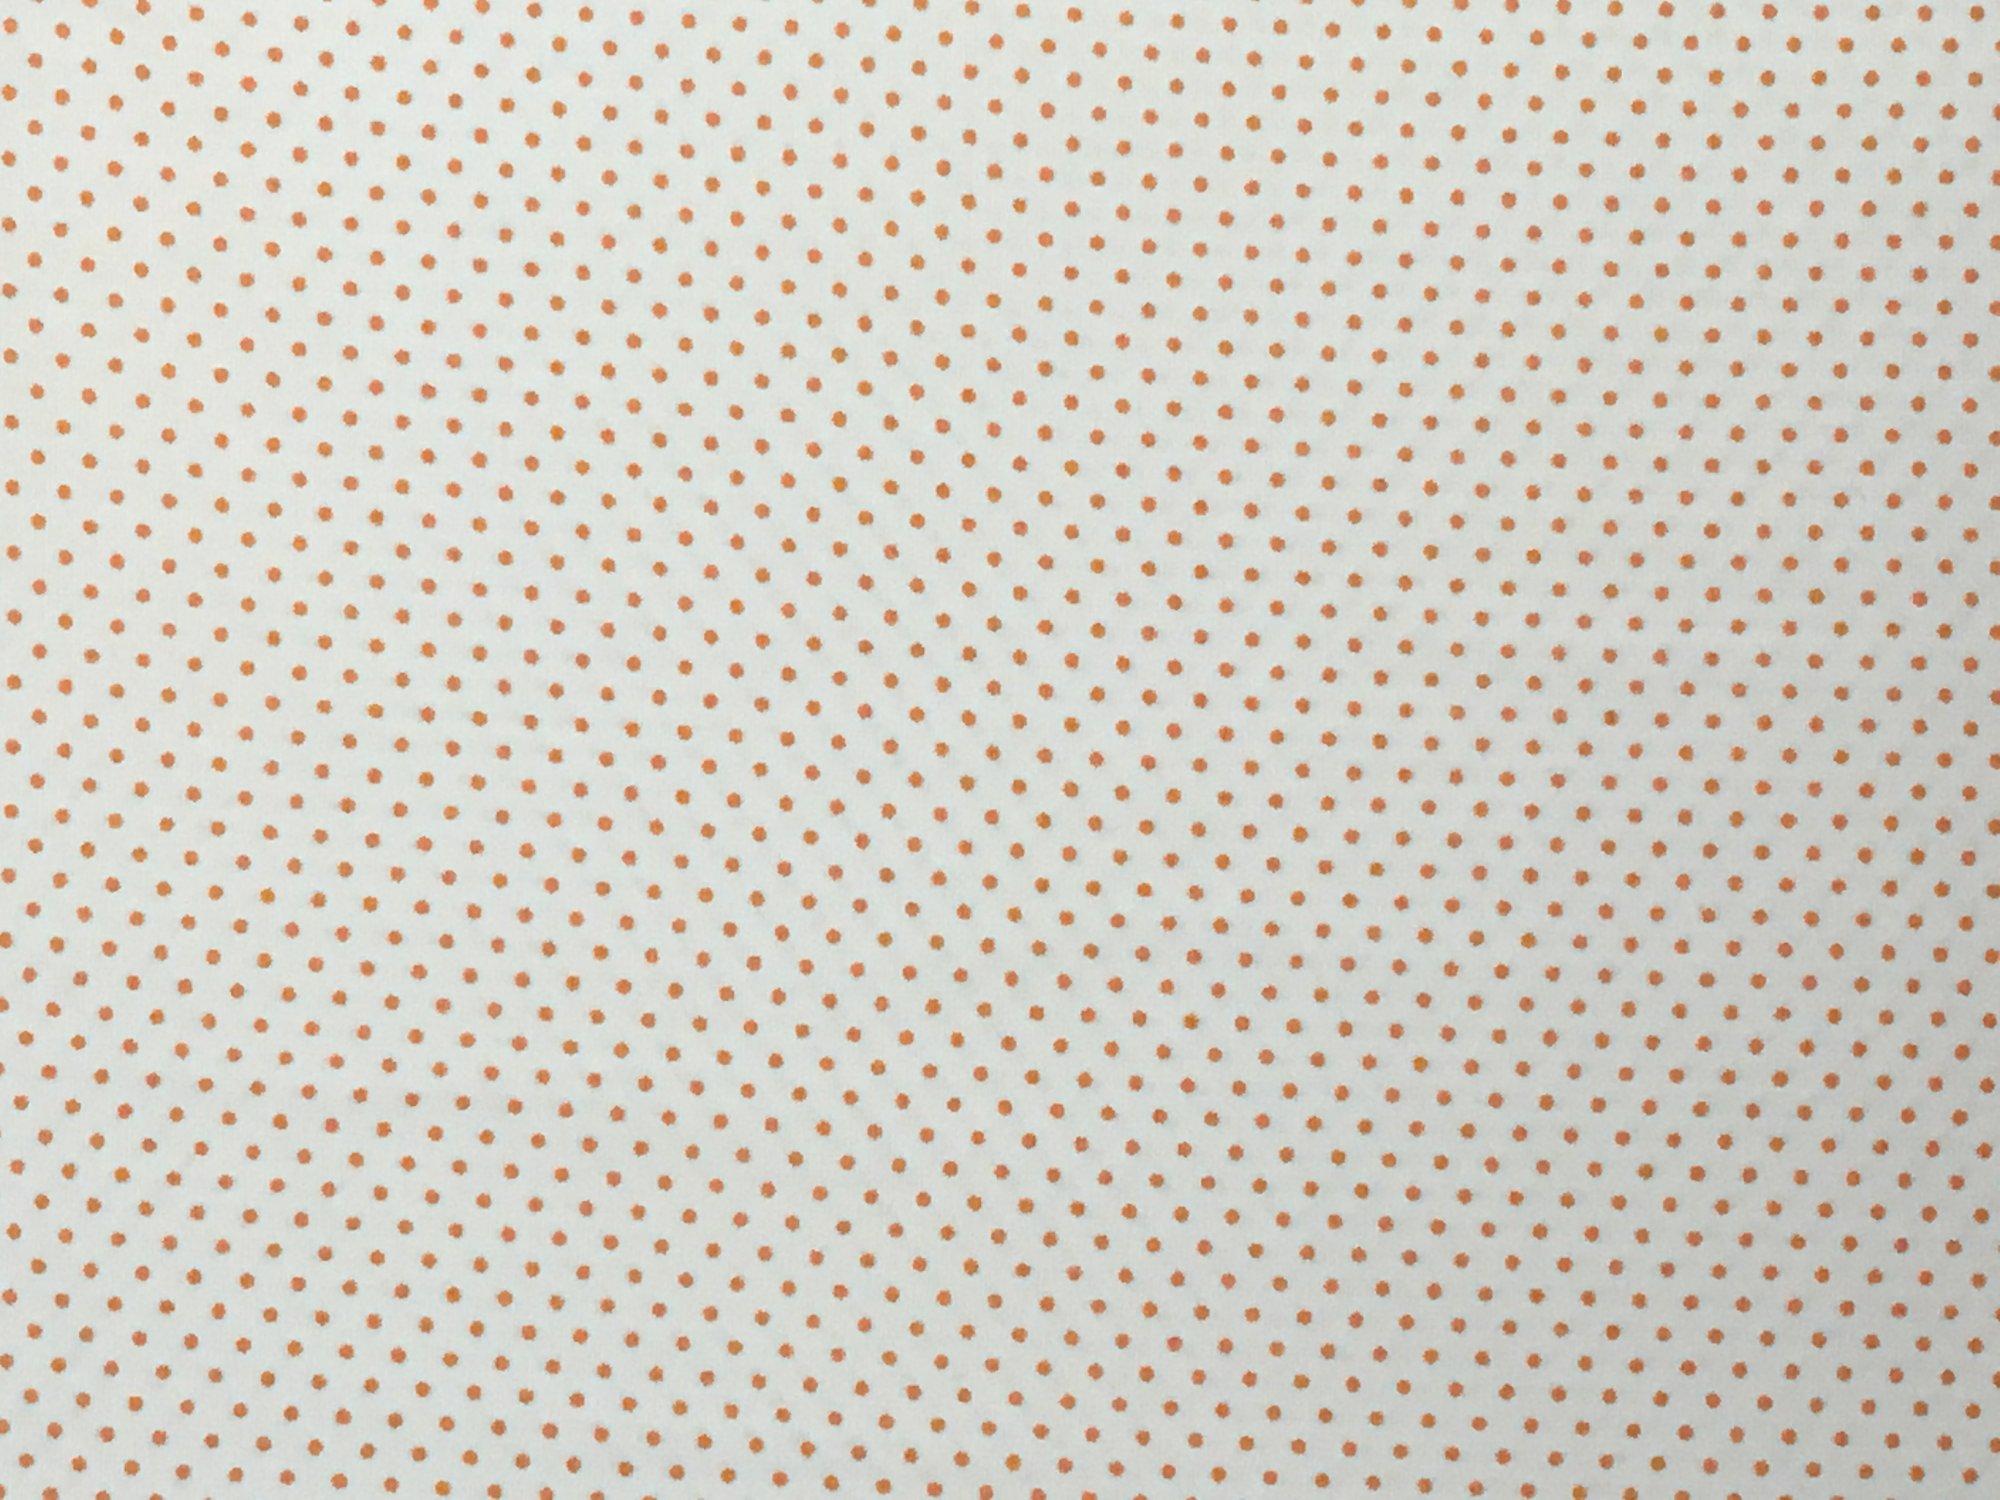 Adaman Coast - Tropical Papaya - Orange Microdot on white